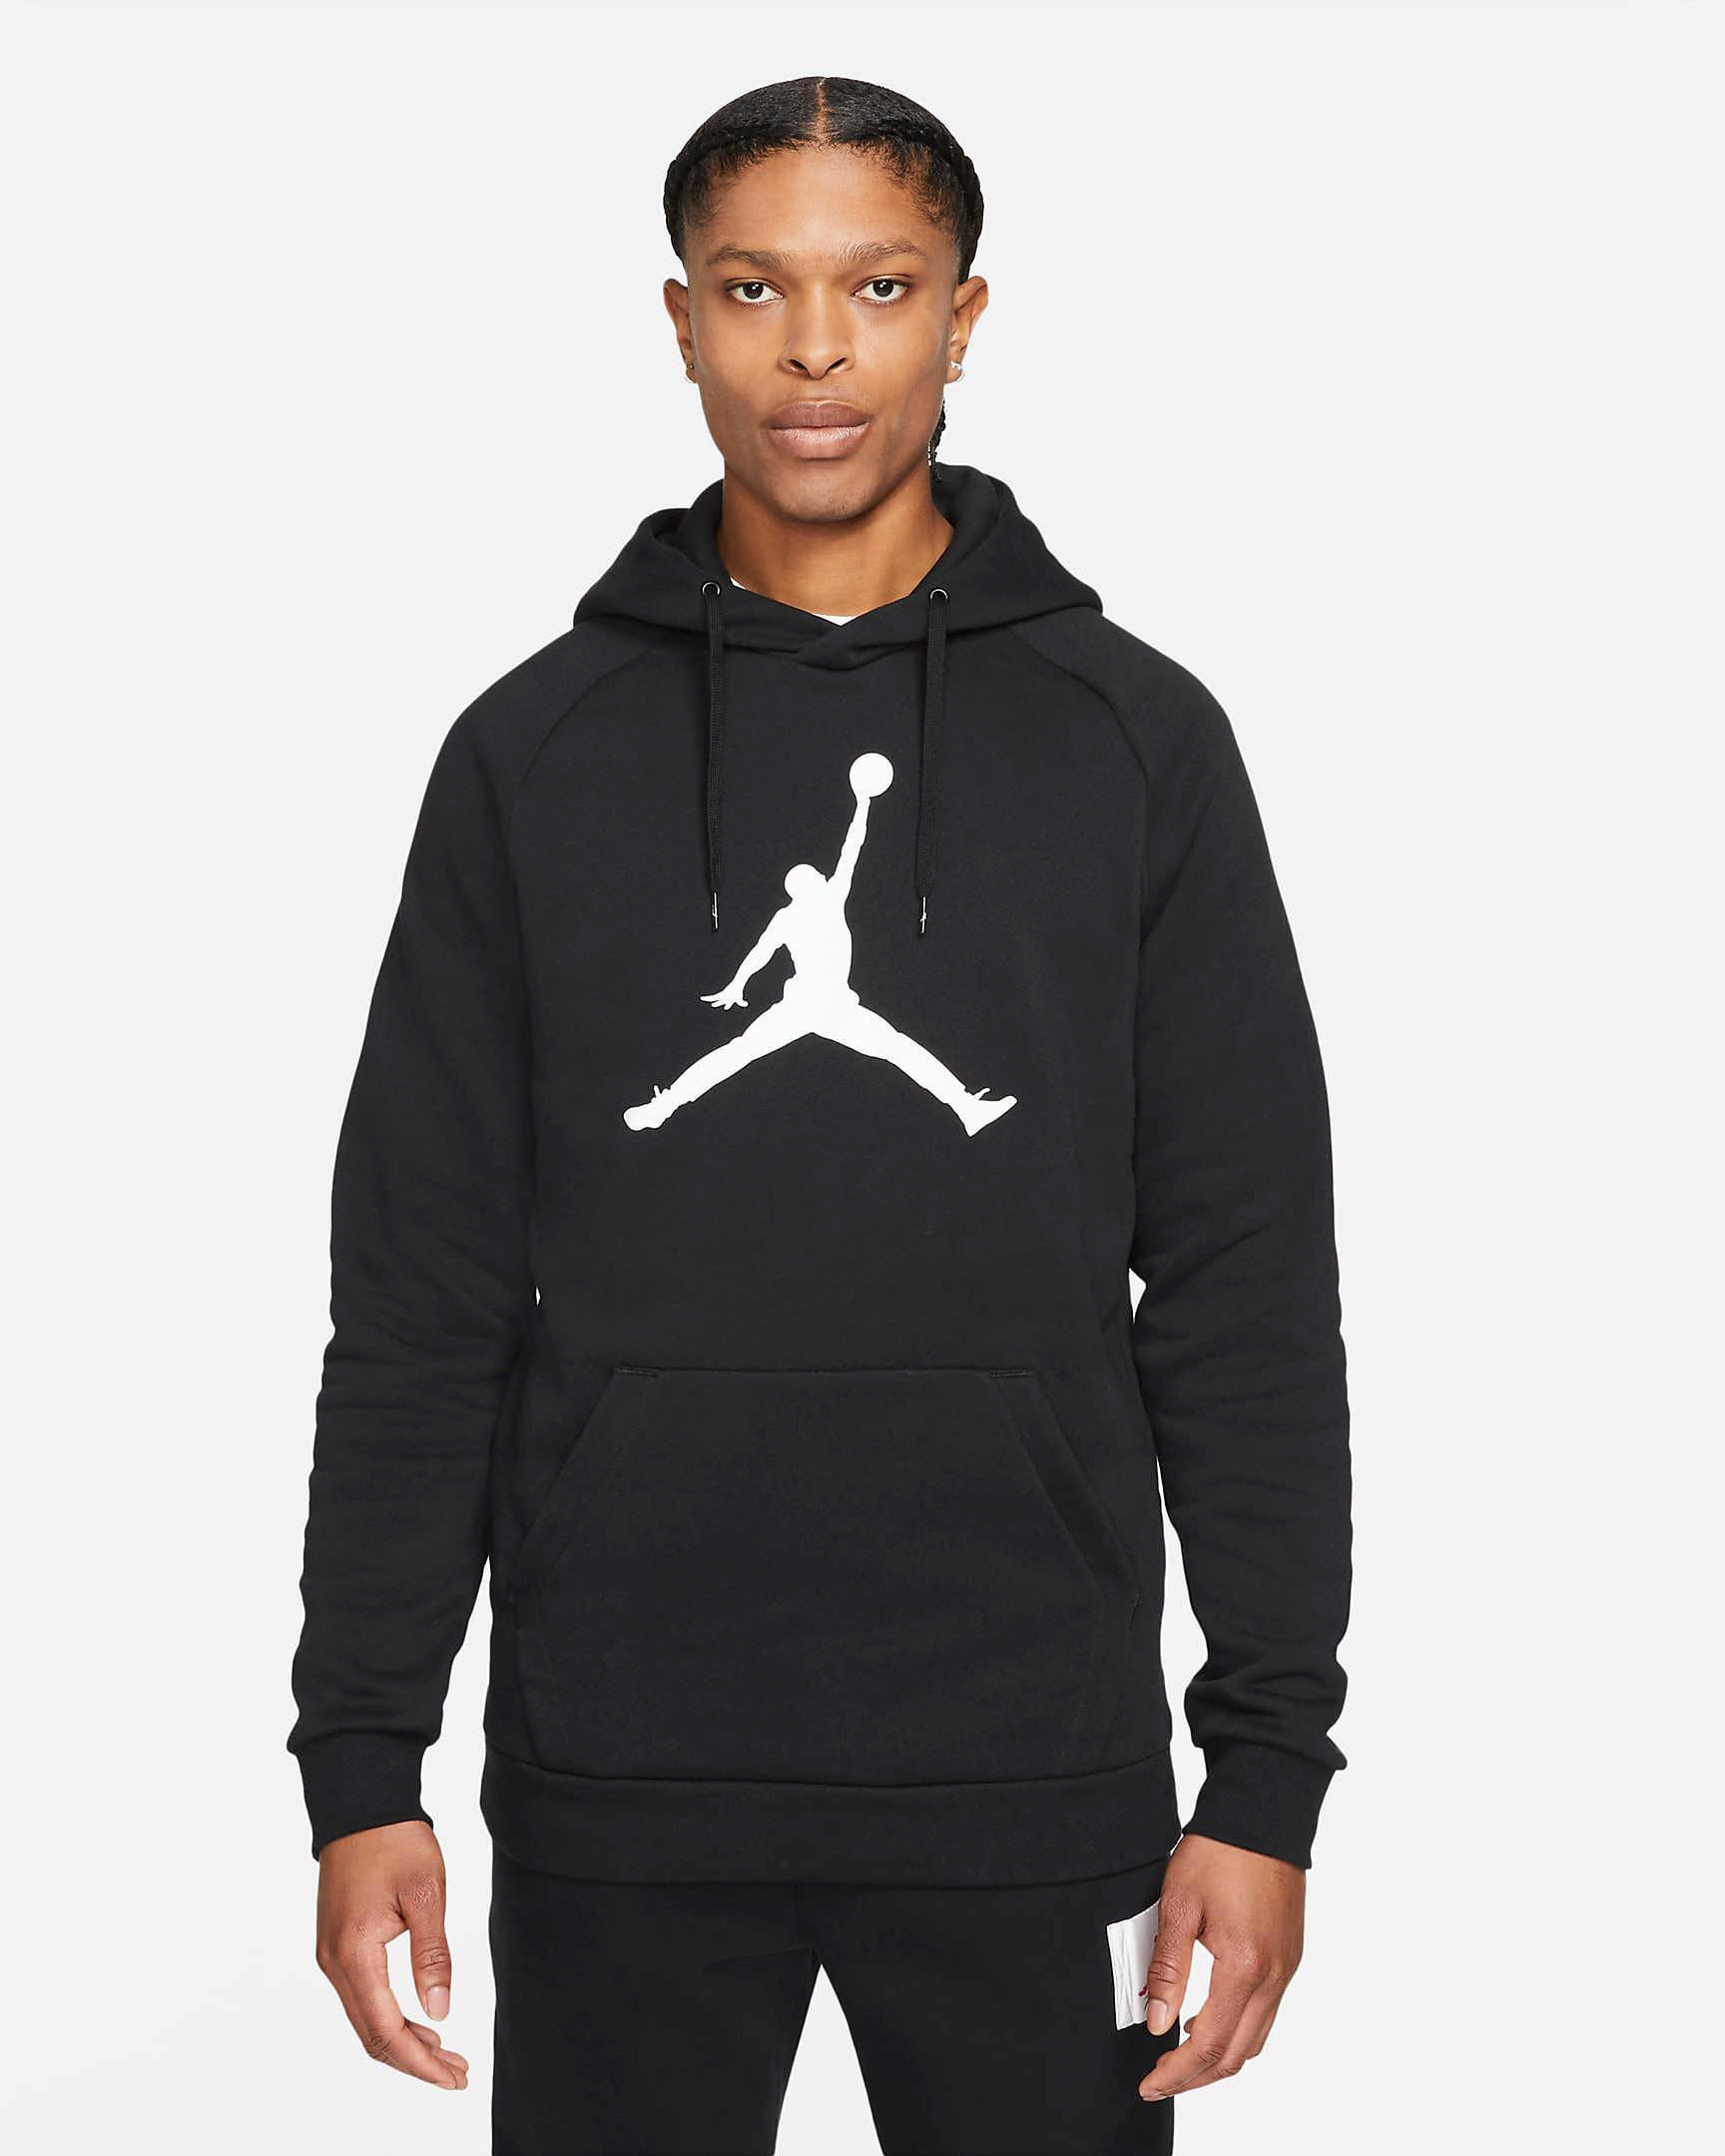 jordan-jumpman-logo-hoodie-black-white